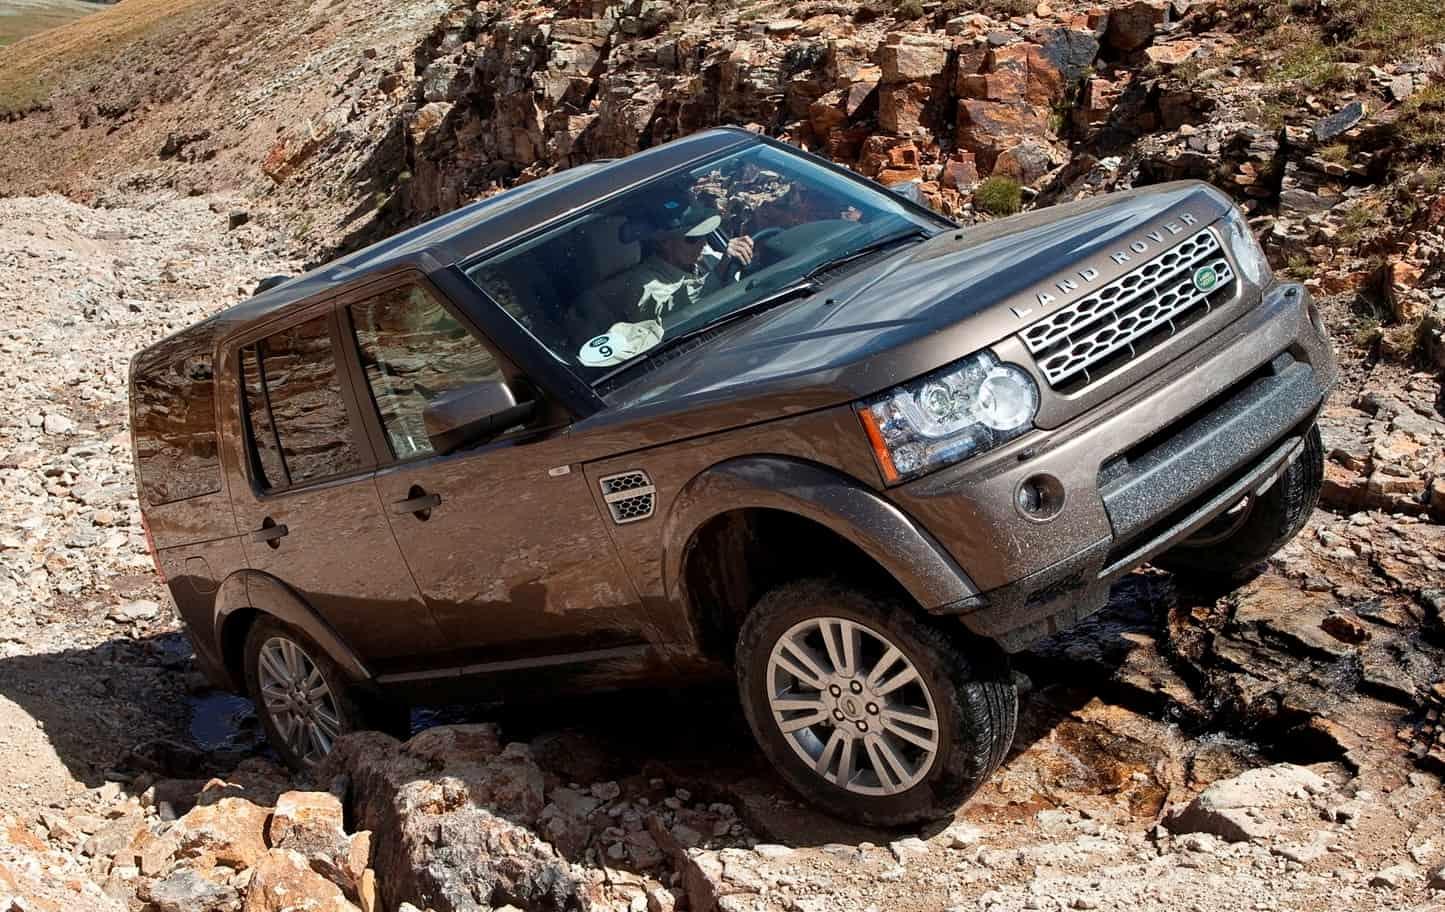 land rover lr4 - Strongest Car Ever?